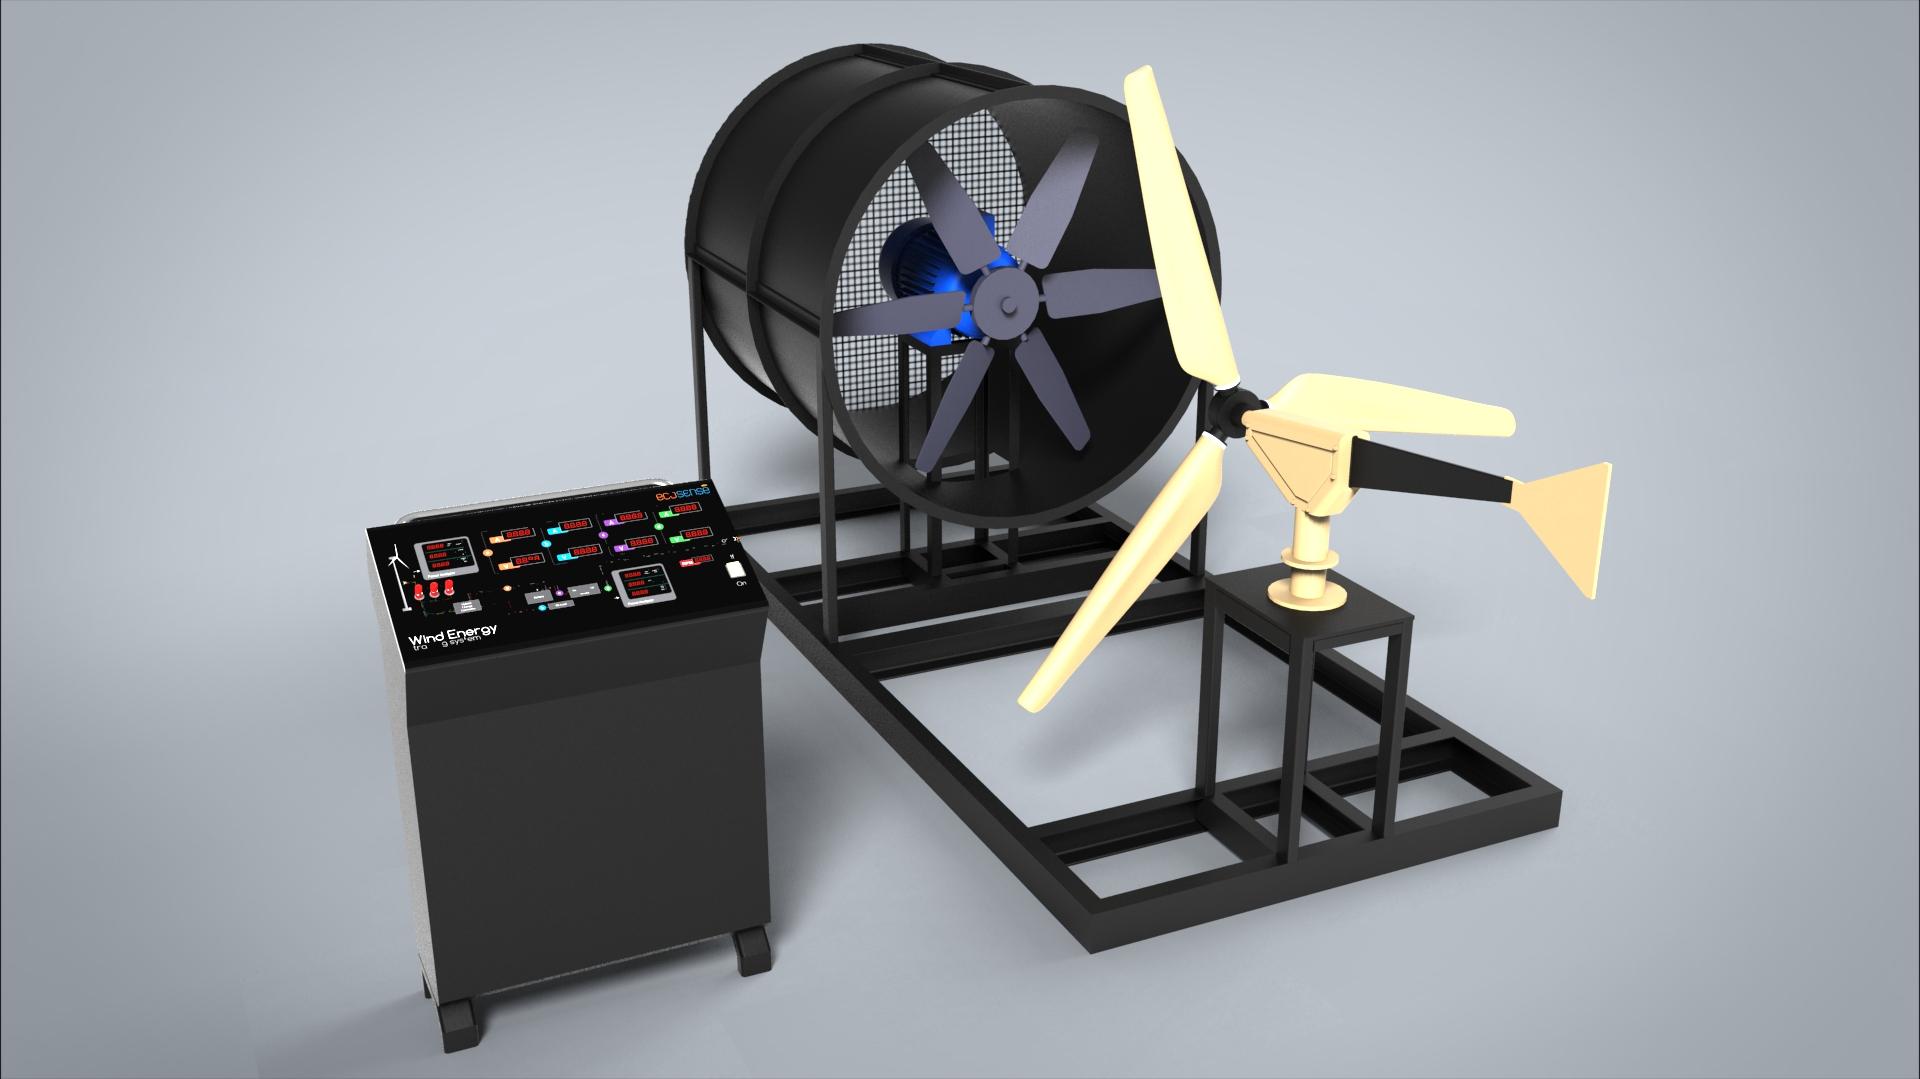 Wind Energy Training System